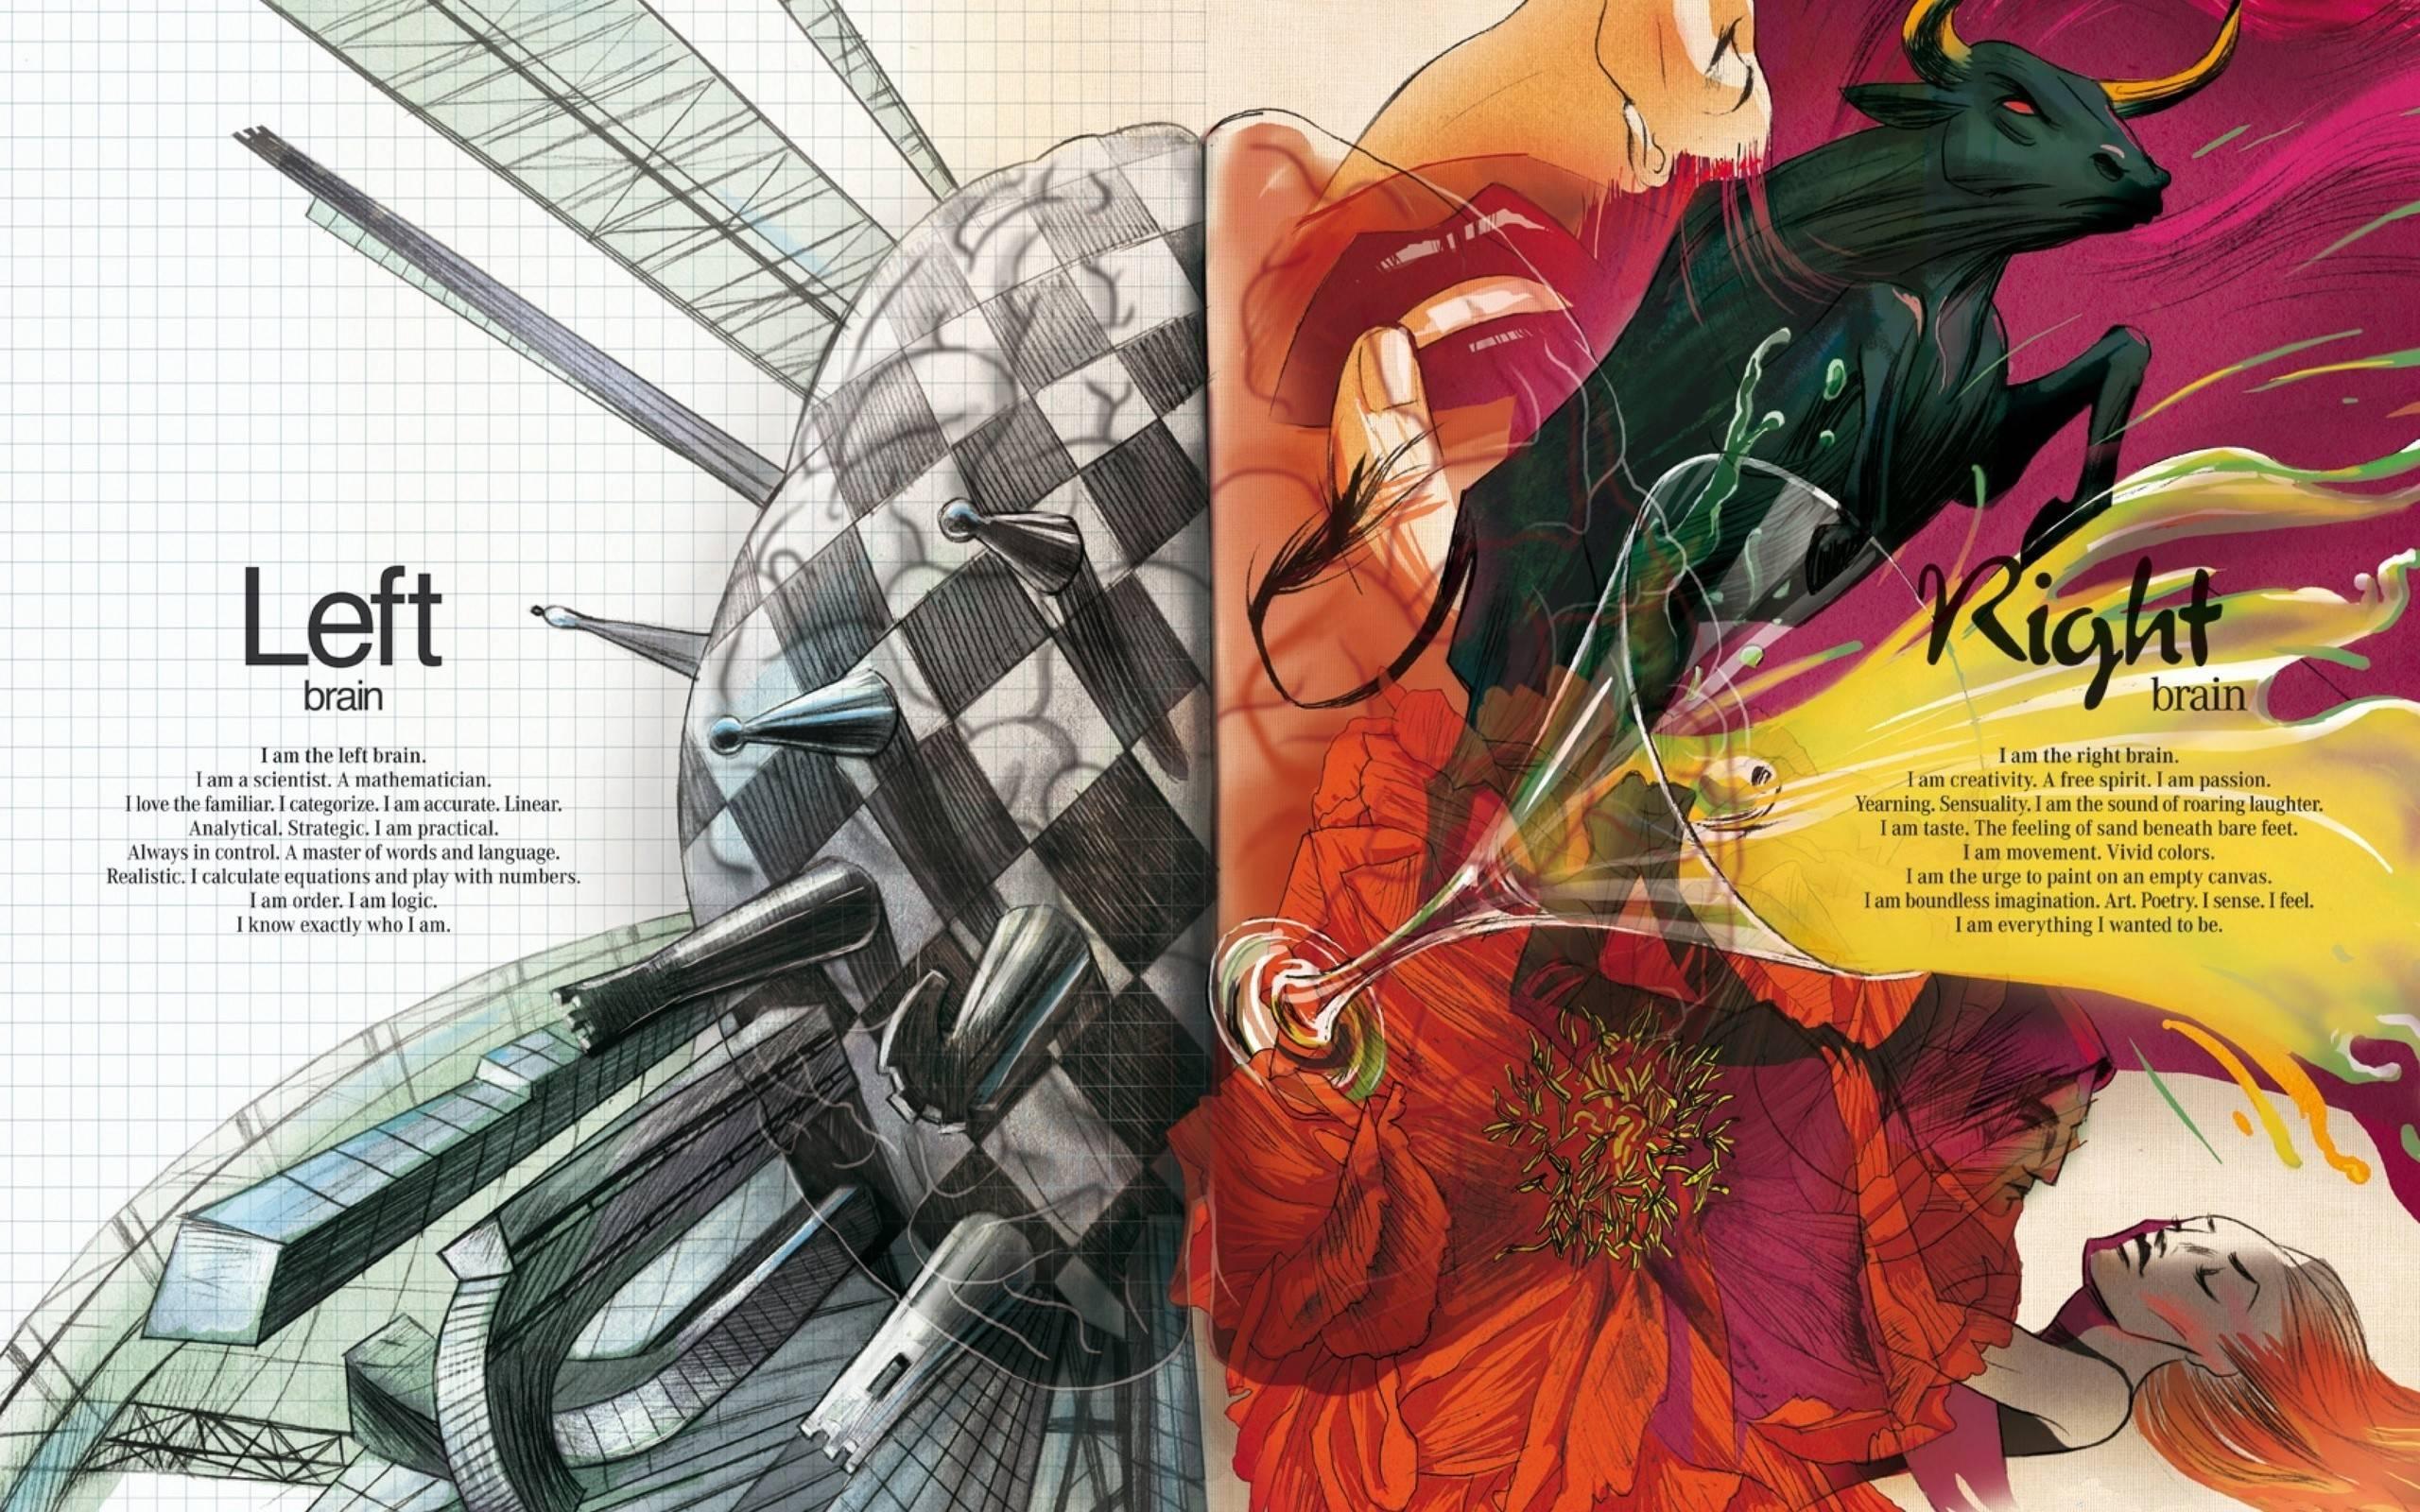 Wallpaper 2560x1600 Px Abstract Anatomy Artwork Brain Digital